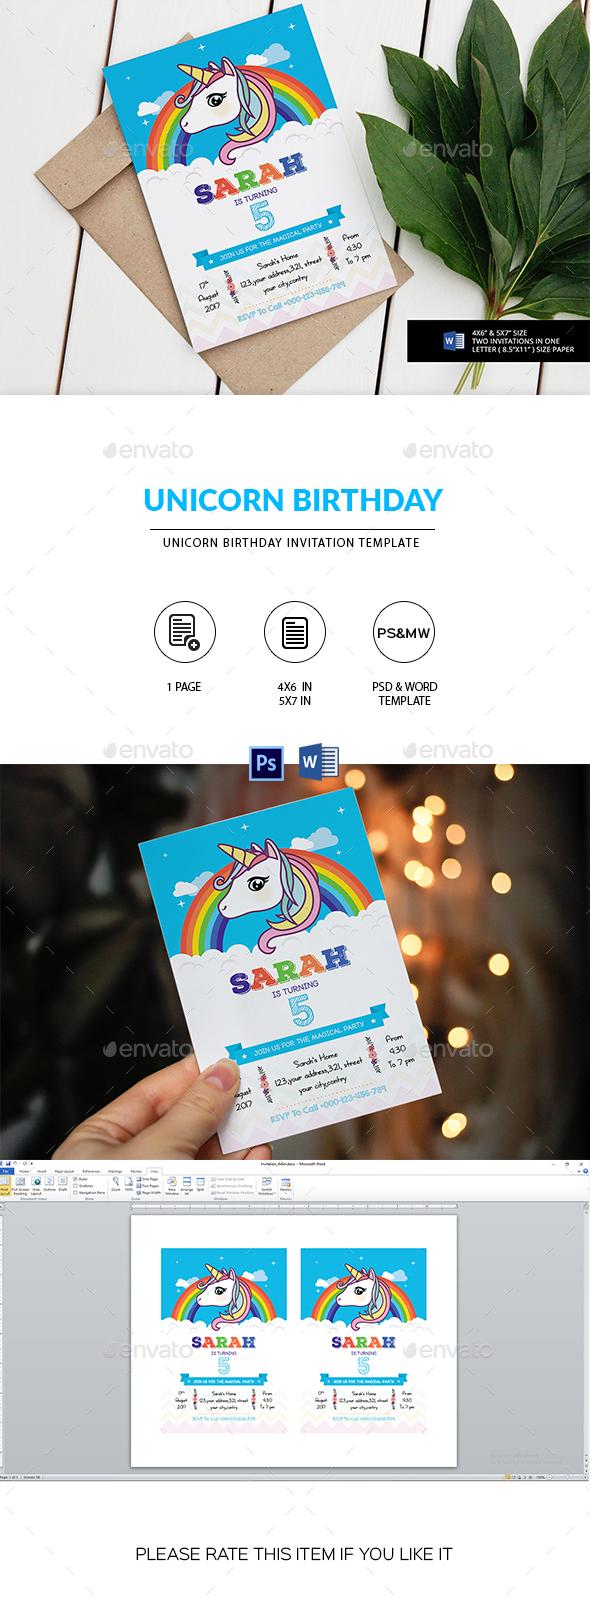 Unicorn Birthday Party Invitation Template - Invitations Cards & Invites